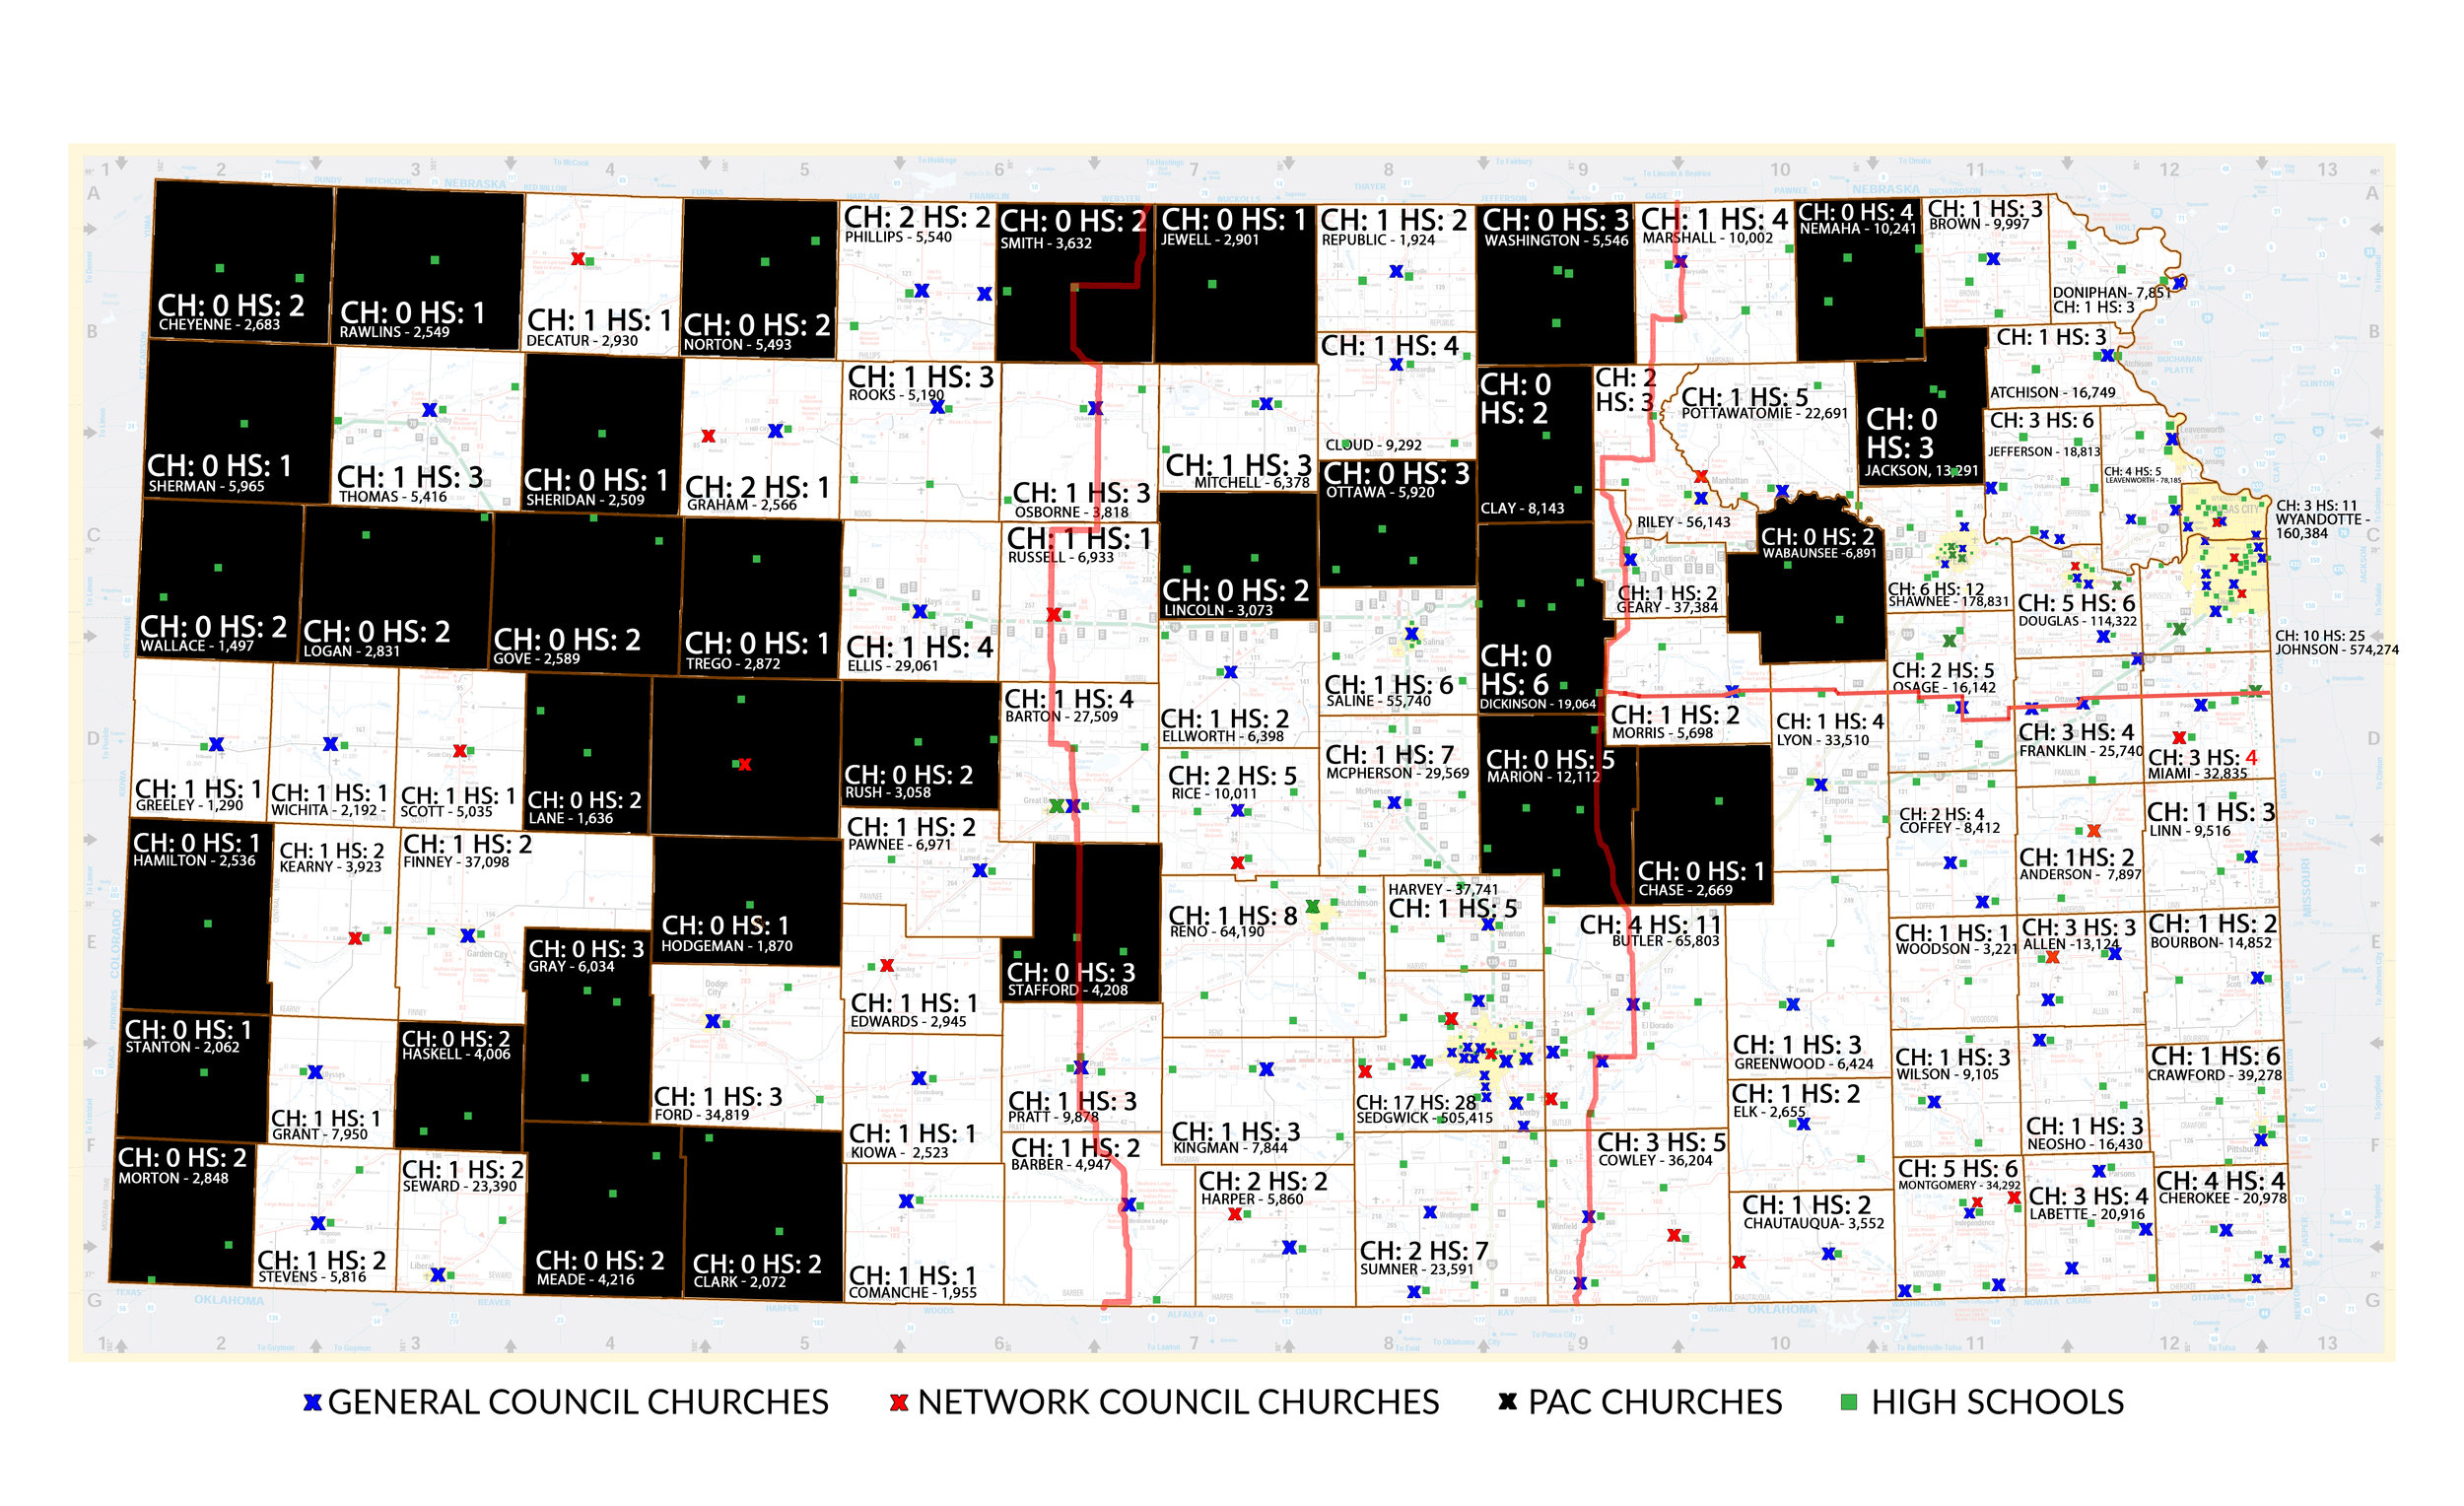 AGK Populations, Churches, Blackout Counties & High Schoolsa.jpg